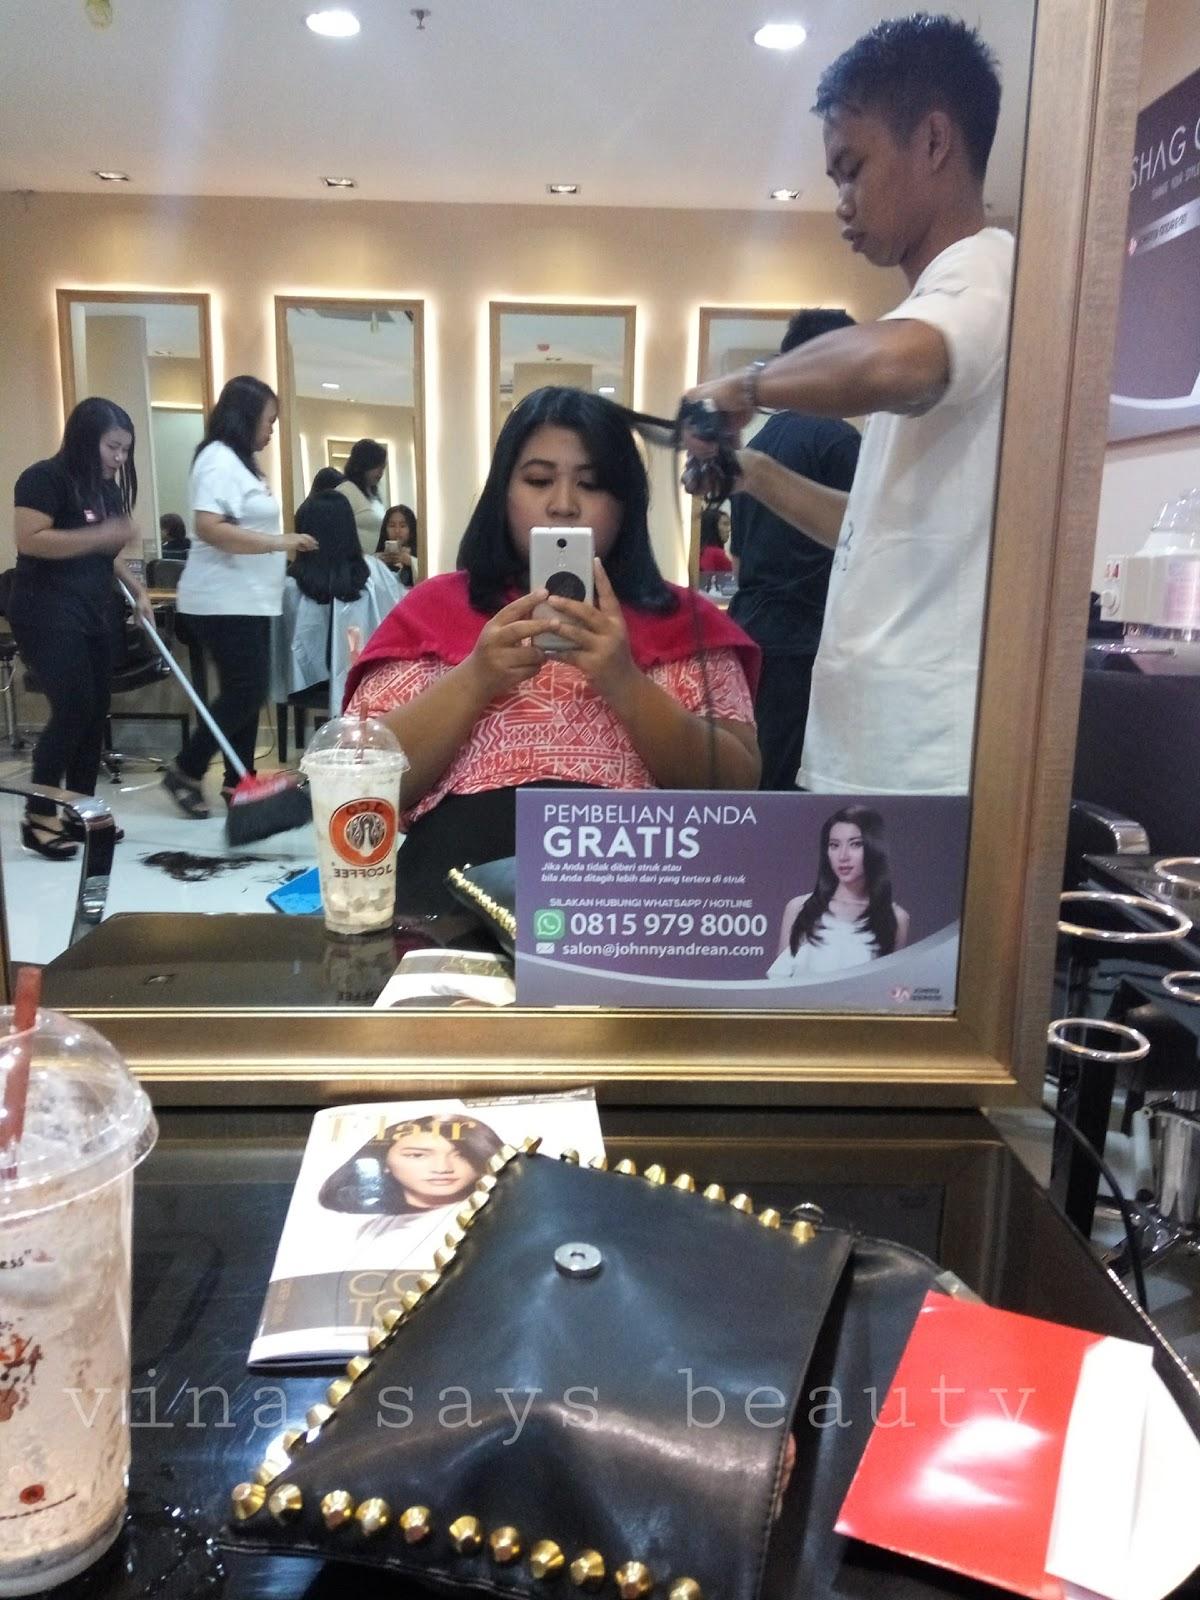 Talks Pengalaman Potong Rambut Di Johnny Andrean Salon Vina Says Beauty